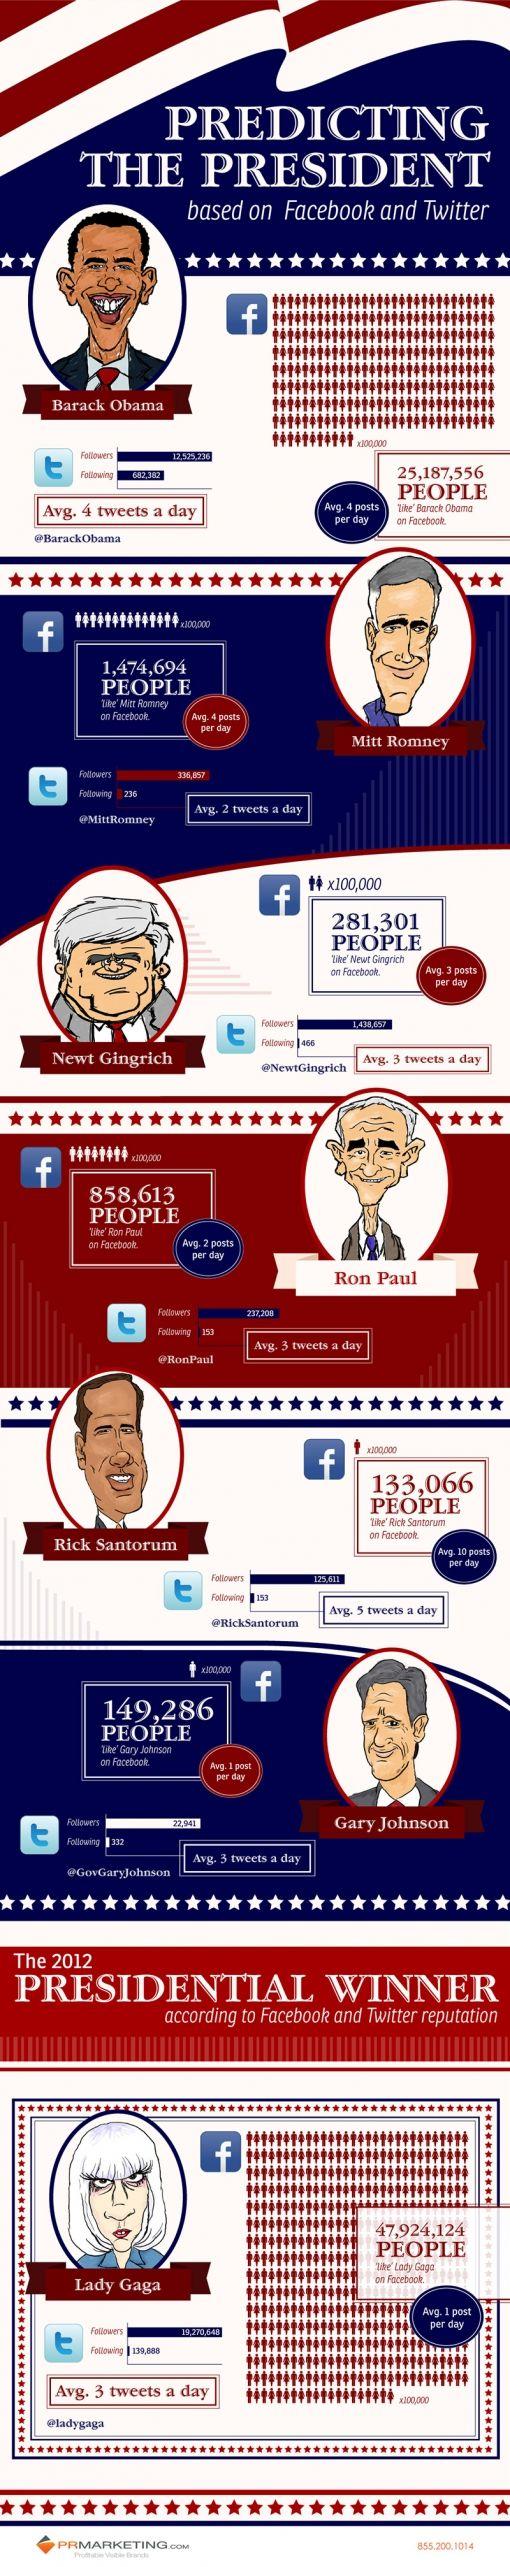 predicting_the_president800